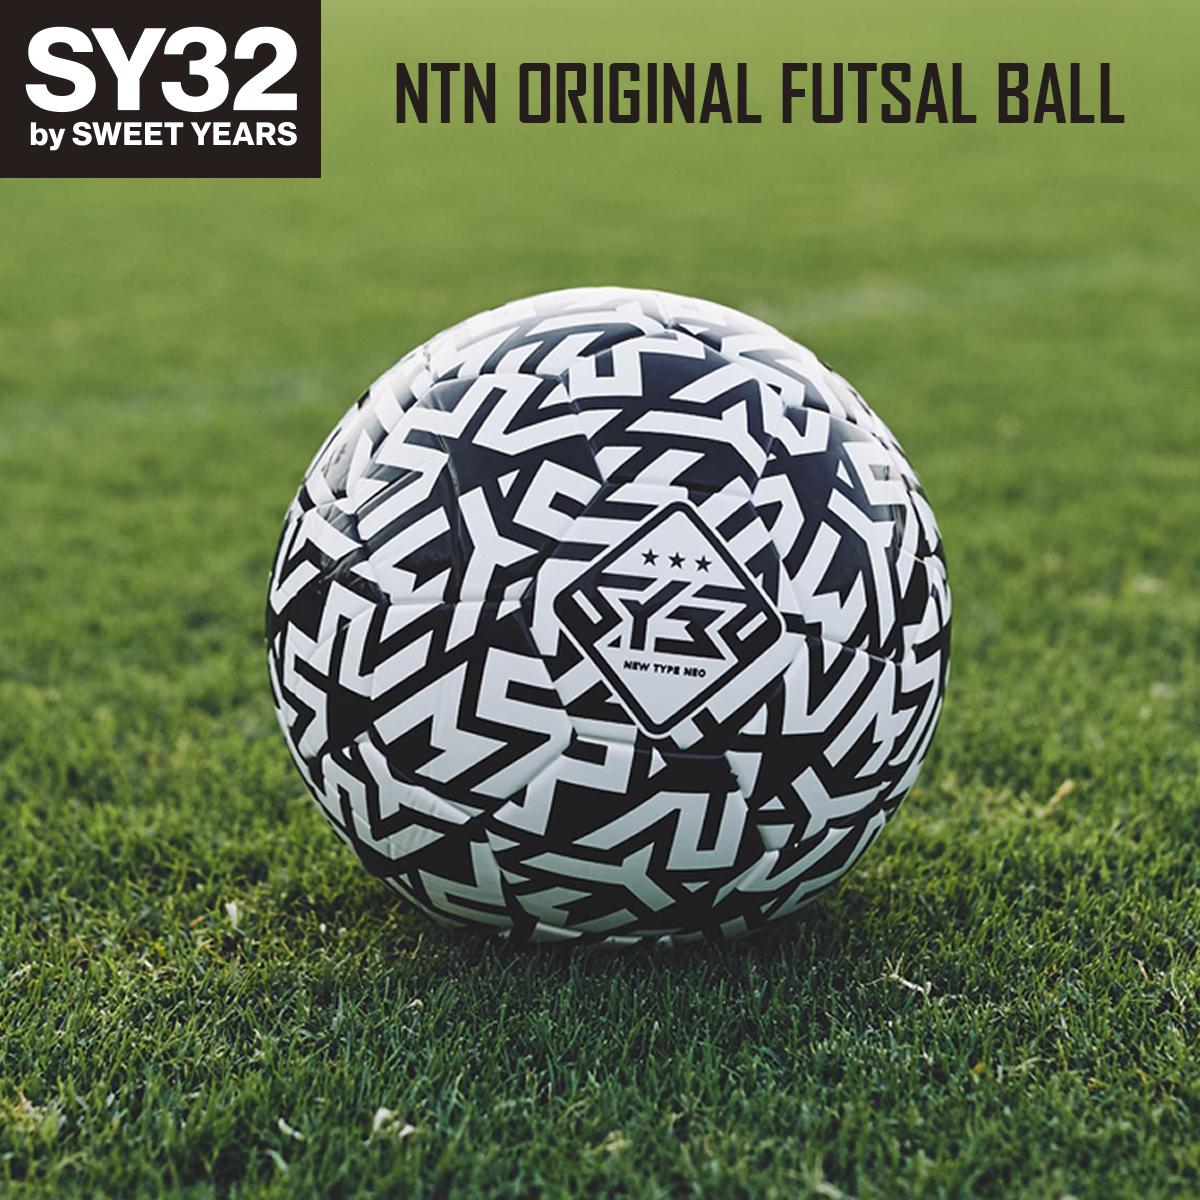 SY32オリジナルフットサルボール 4号球 フットサルボール NEW TYPE NEO NTN ORIGINAL FUTSAL by セール価格 SWEET ついに再販開始 BALL SY32 Official 9196 エスワイサーティトゥバイスウィートイヤーズ YEARS オフィシャル